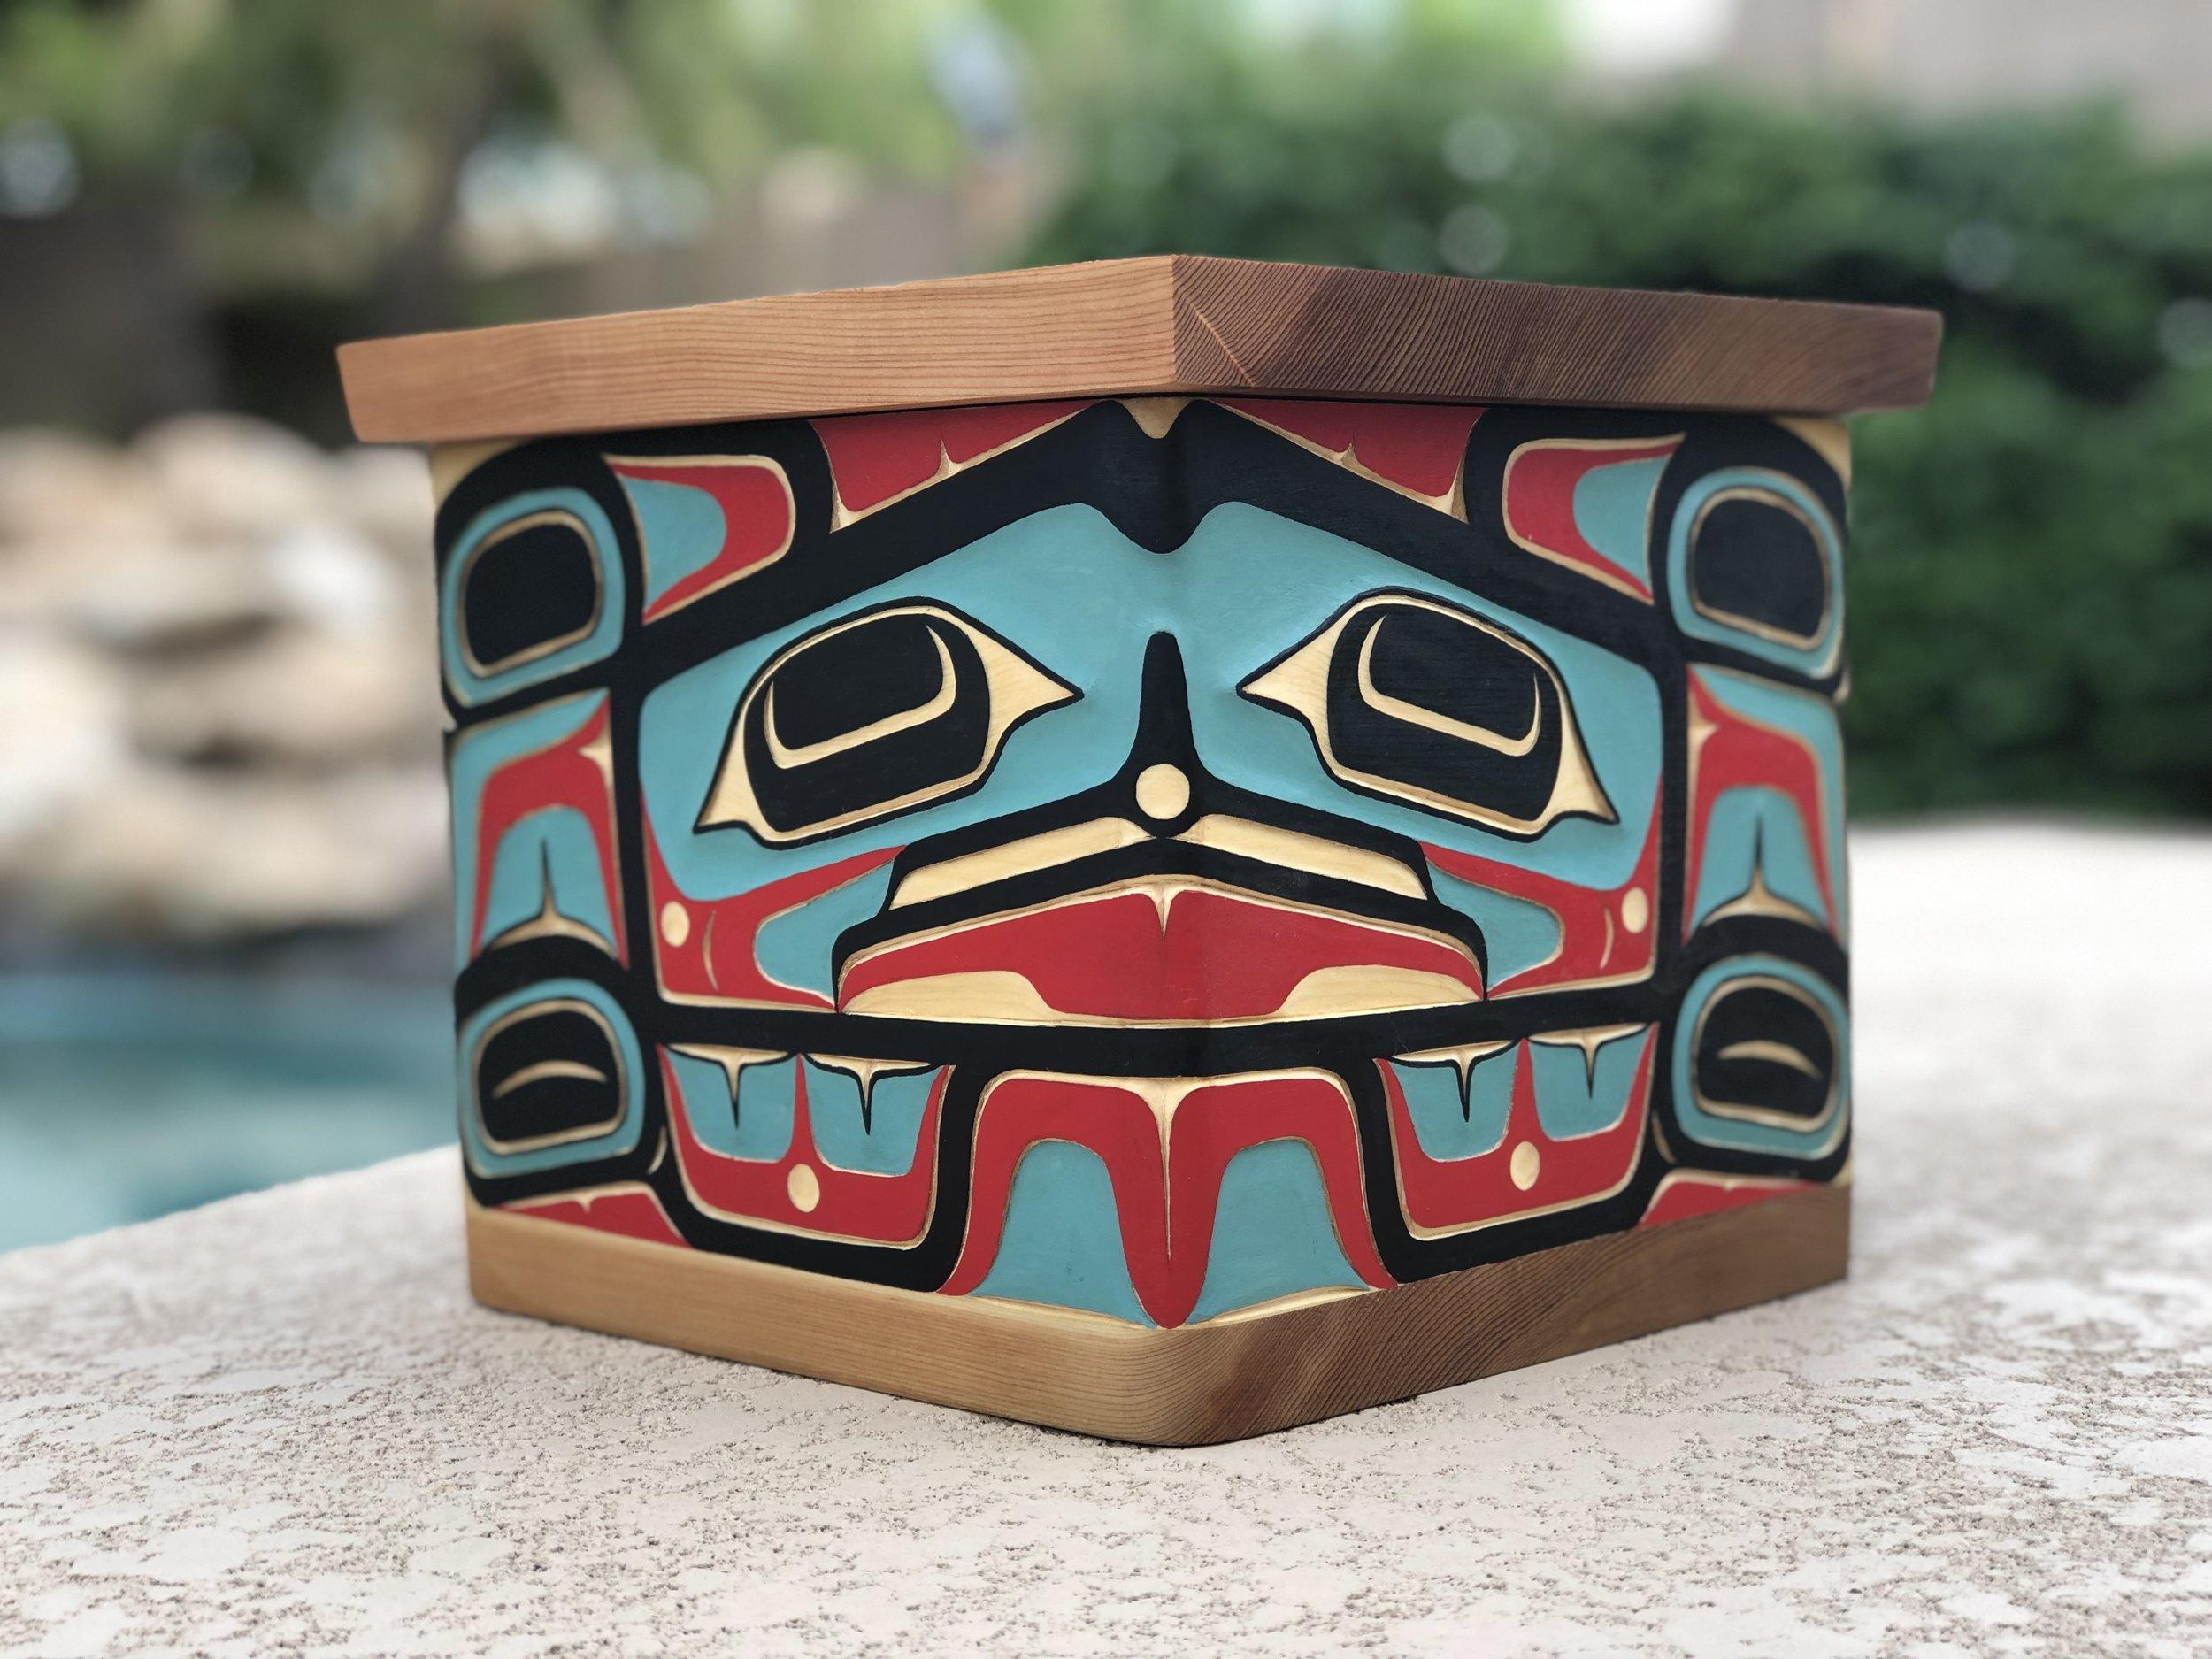 Bentwood Box / Yellow Cedar,Red Cedar / *2019 SWAIA Sante Fe Indian Market 1st Place Wood Sculpture